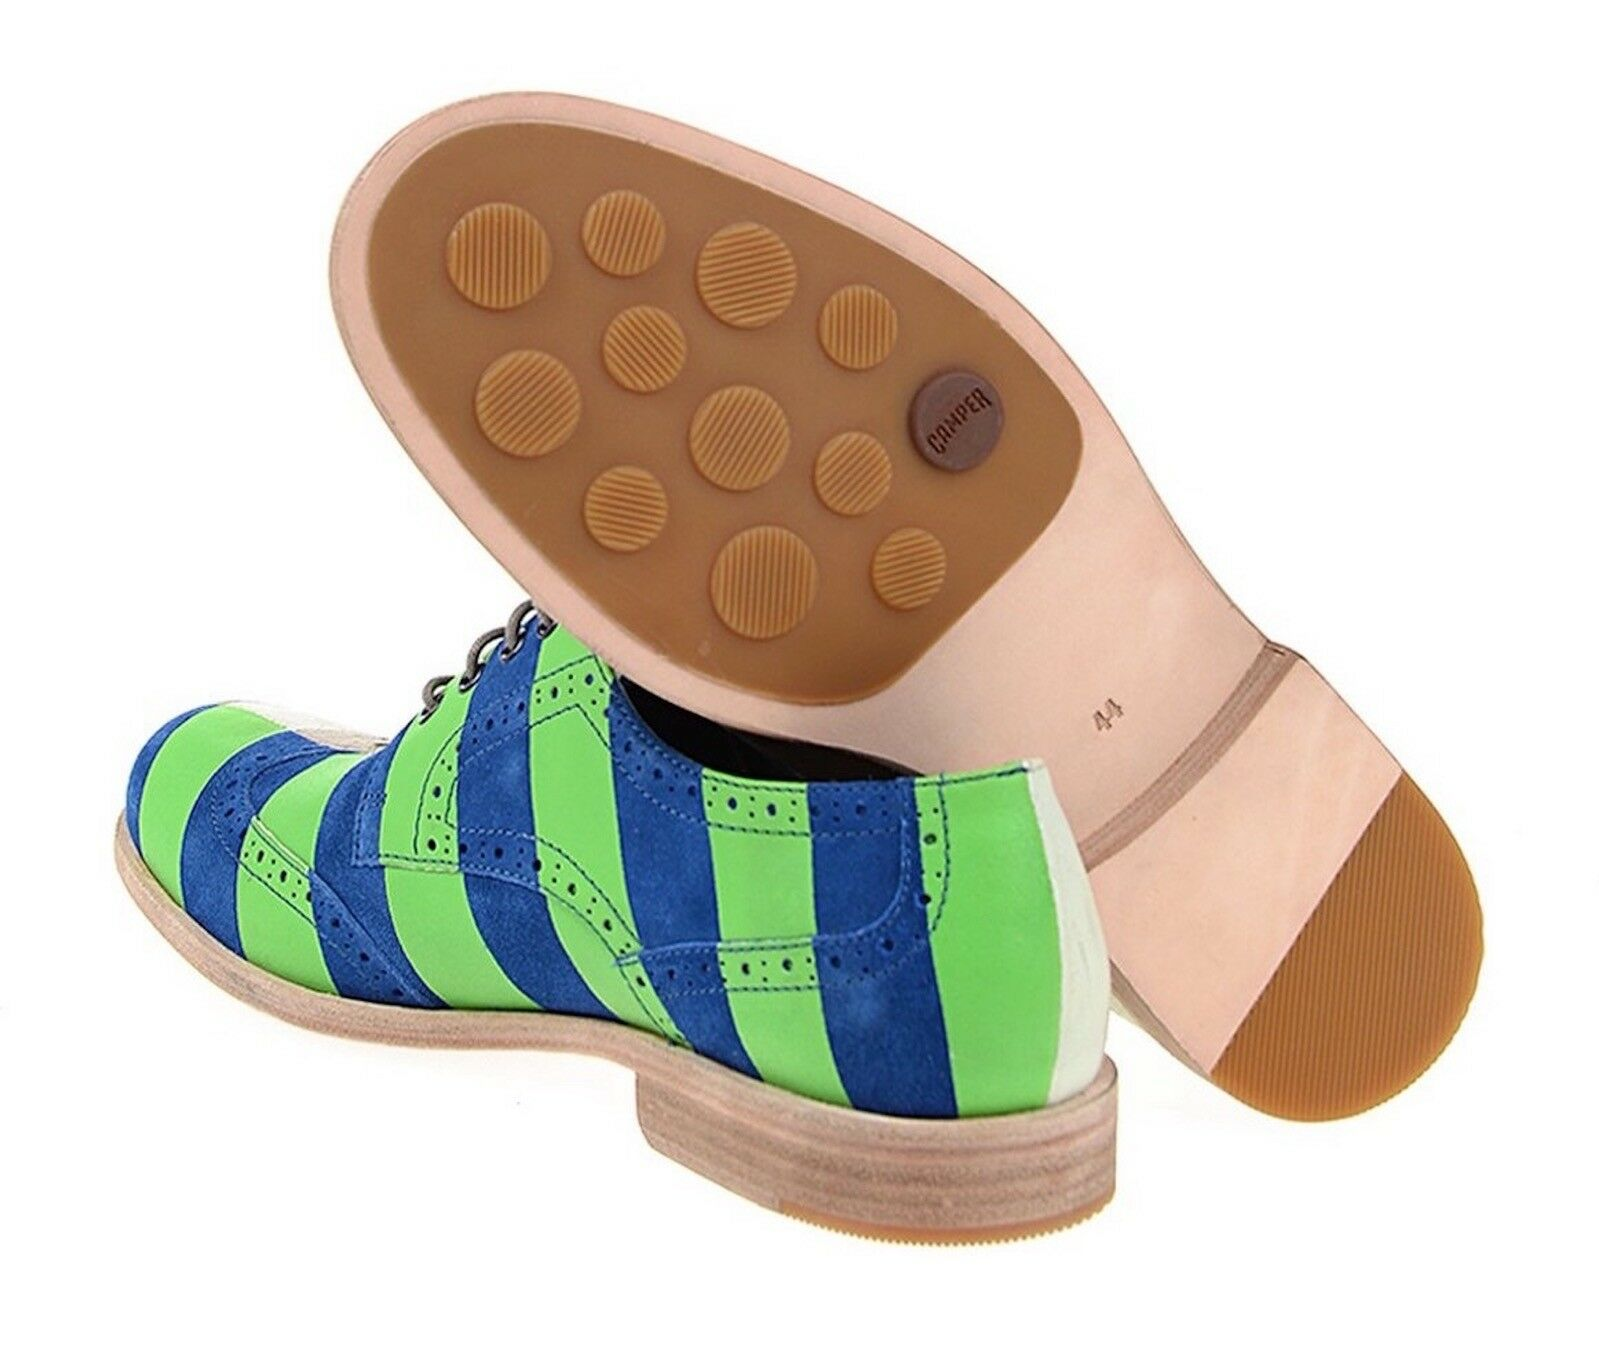 prezzo all'ingrosso e qualità affidabile Bernhard Willhelm X X X Camper US 6 EU 39 Together Twins Formal scarpe Uomo 18888-001  moda classica